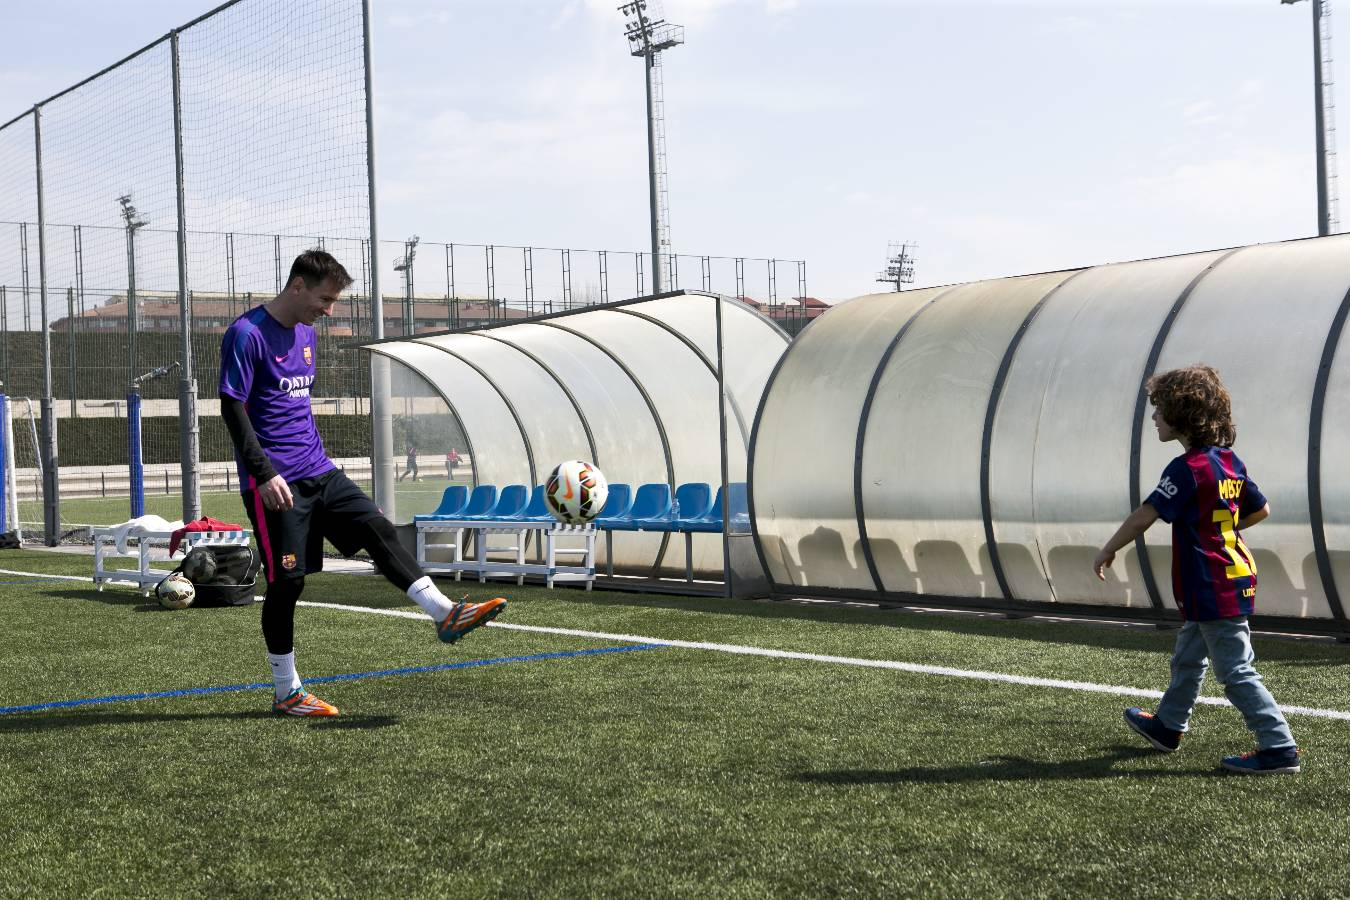 ویدیو :تبلیغ بازیکنان بارسلونا برای لوازم خانگیbeko